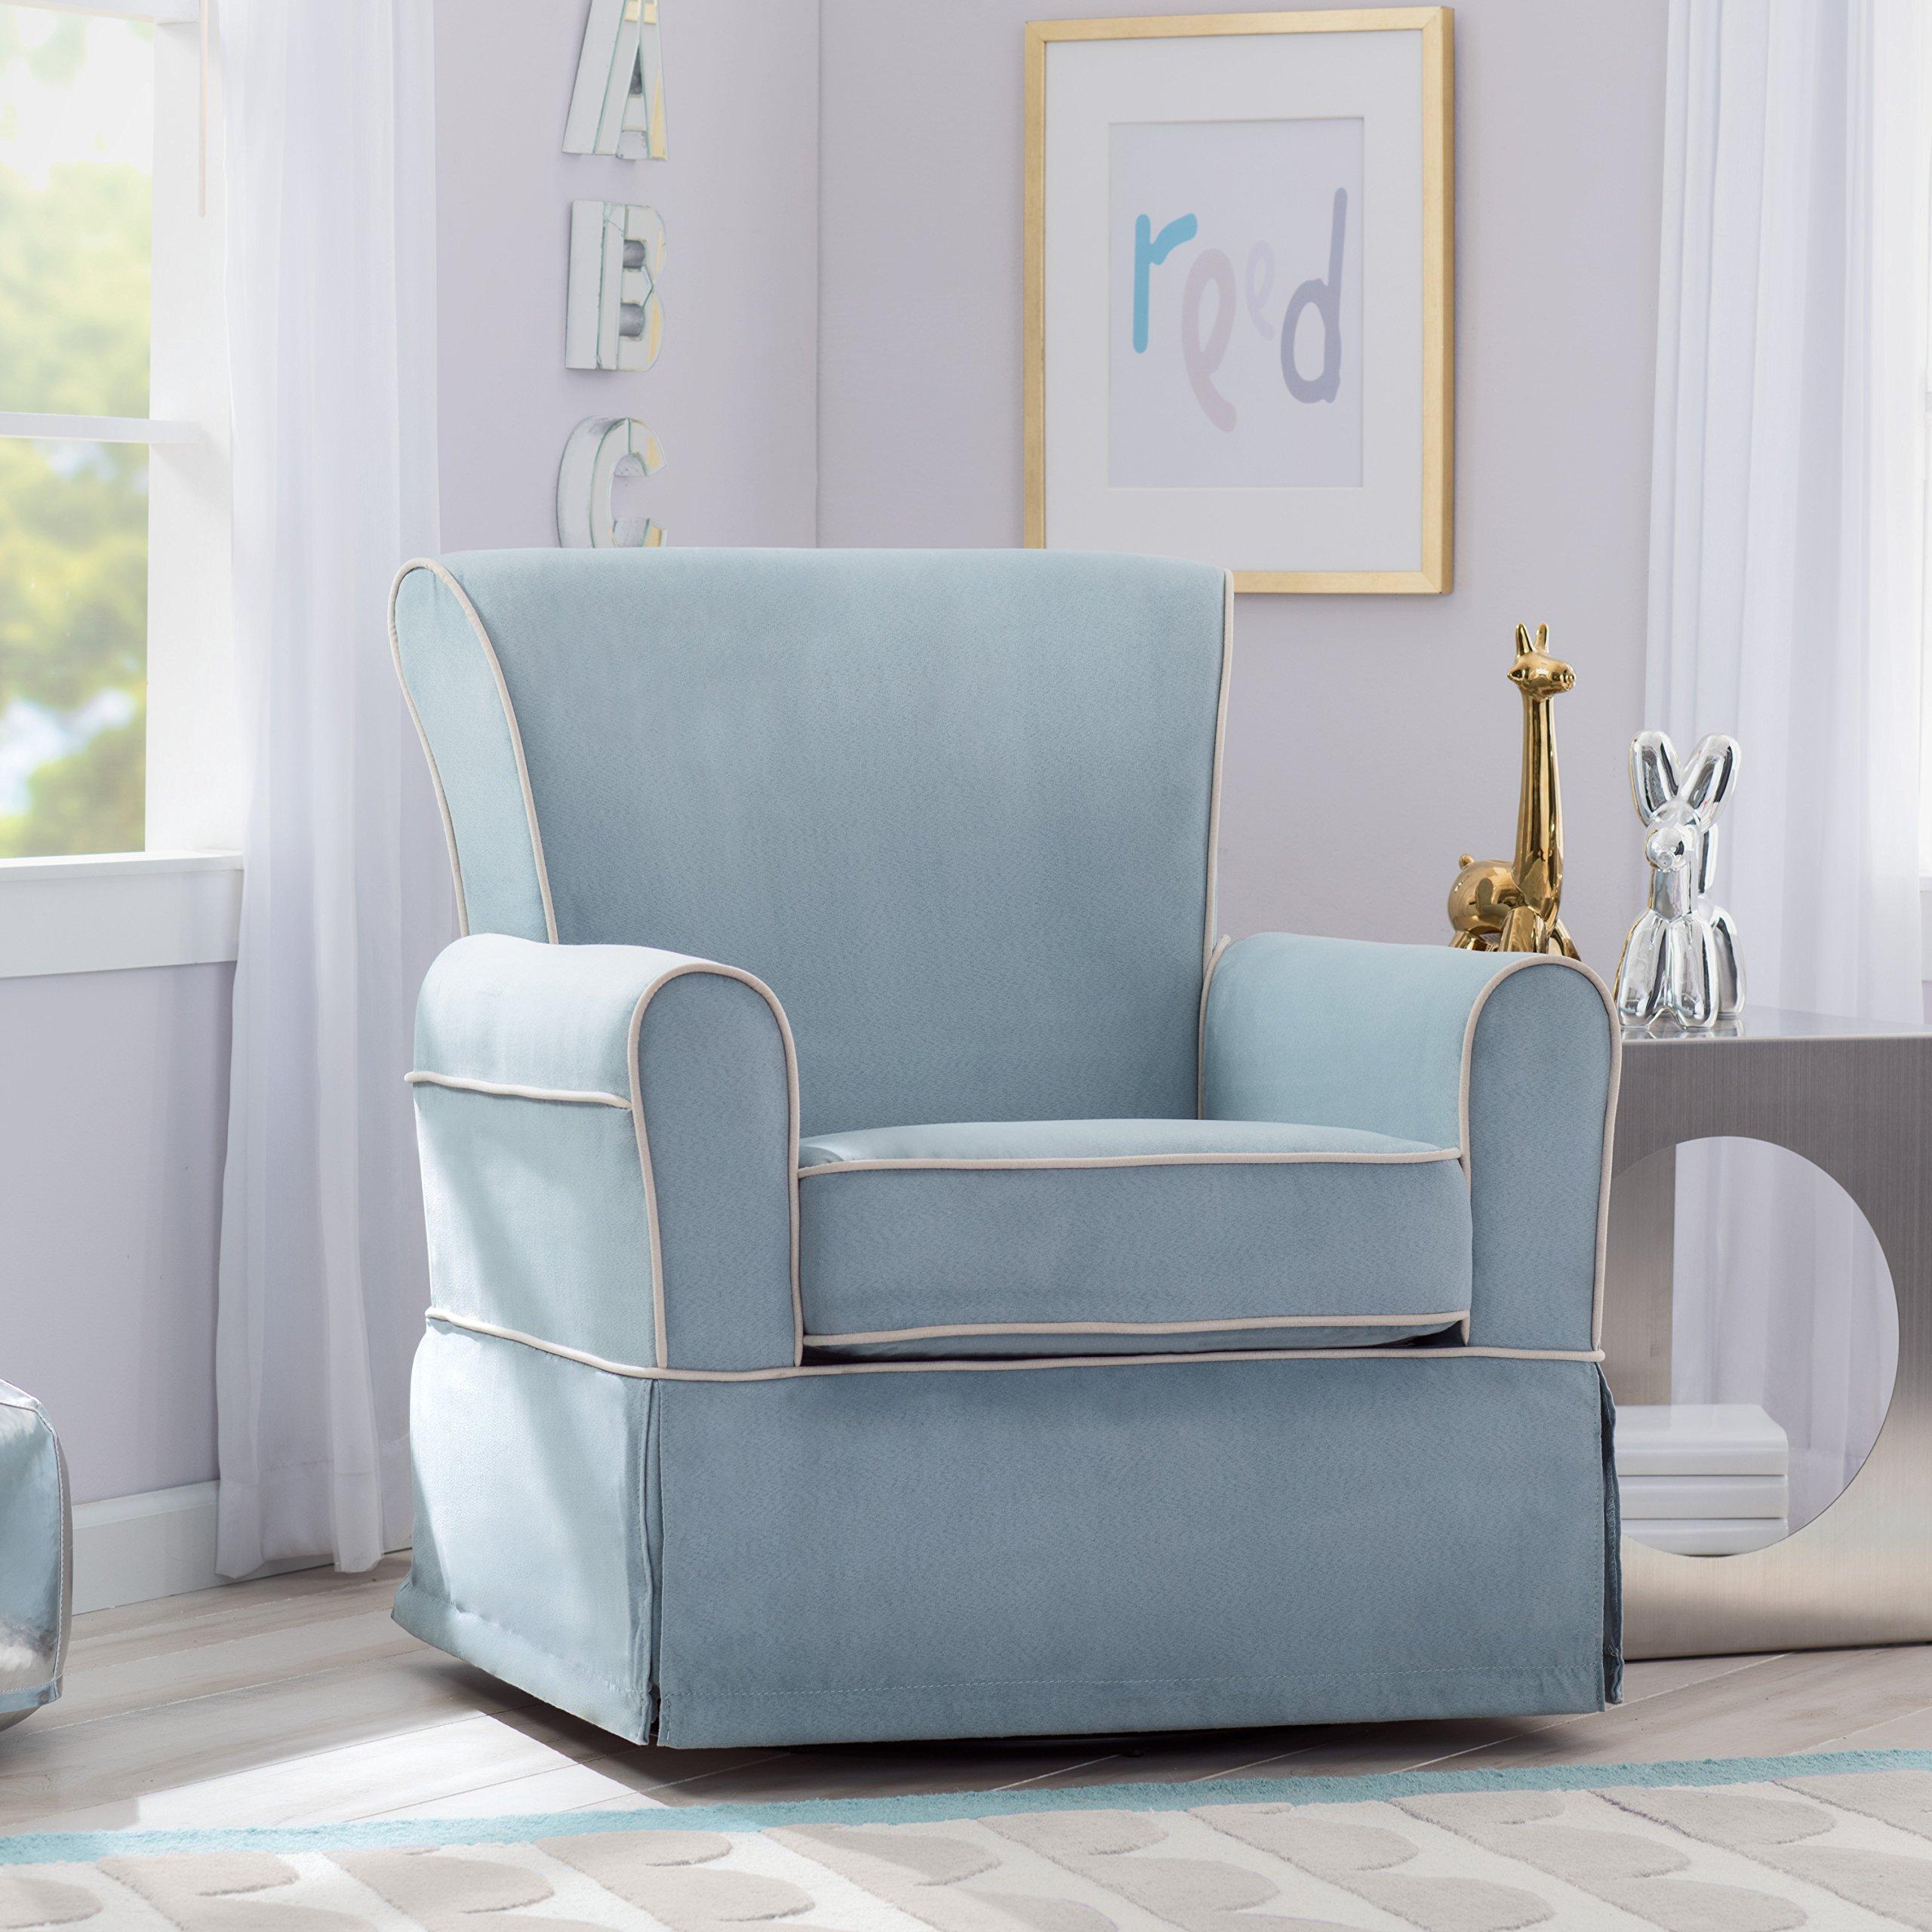 Delta Furniture Benbridge Upholstered Glider Swivel Rocker Chair, Frozen Blue with Cream Welt by Delta Furniture (Image #2)